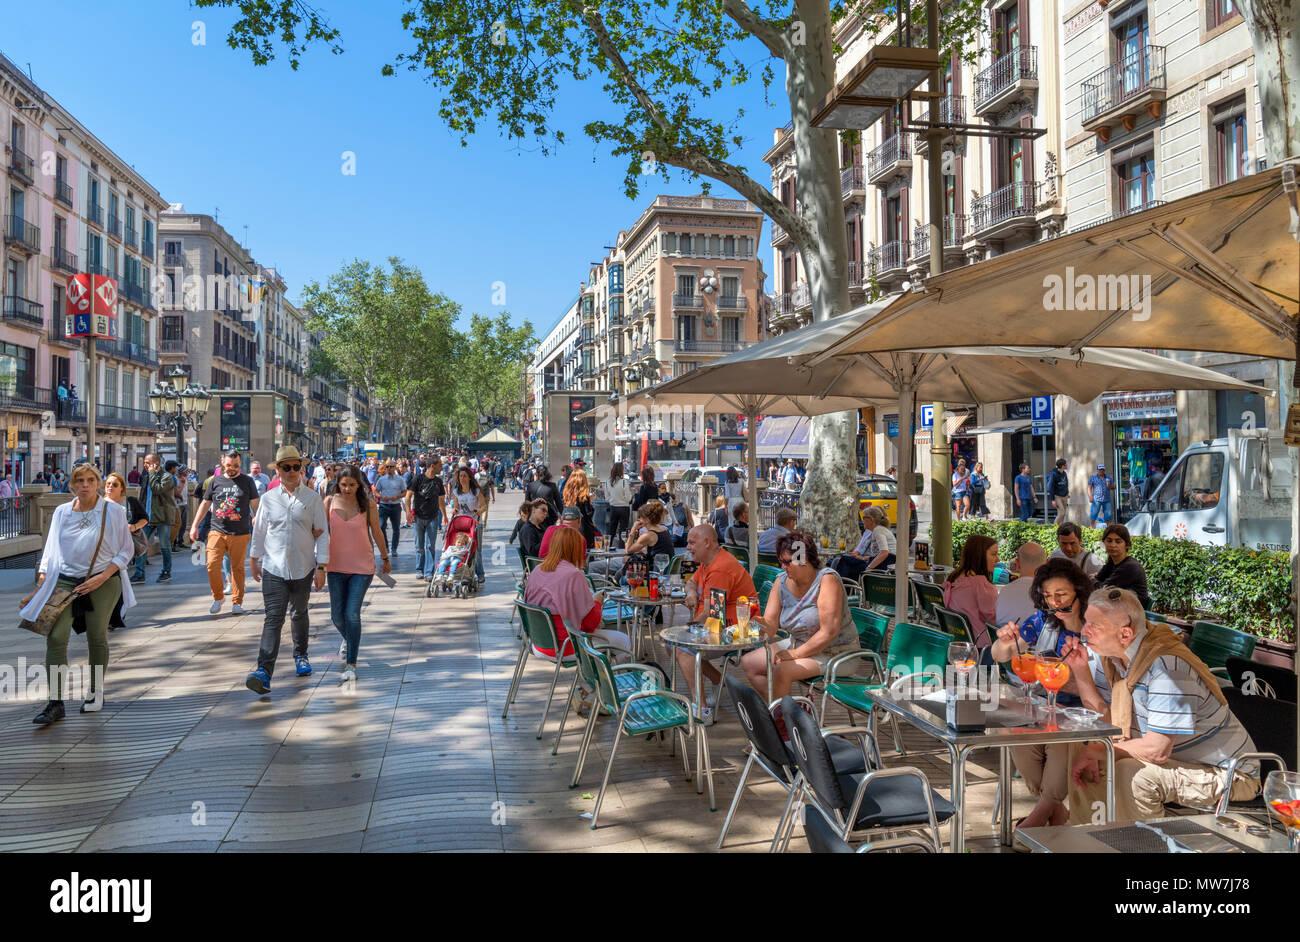 Las Ramblas, Barcelona. Cafe an der belebten Rambla dels Caputxins, Barcelona, Katalonien, Spanien. Stockbild